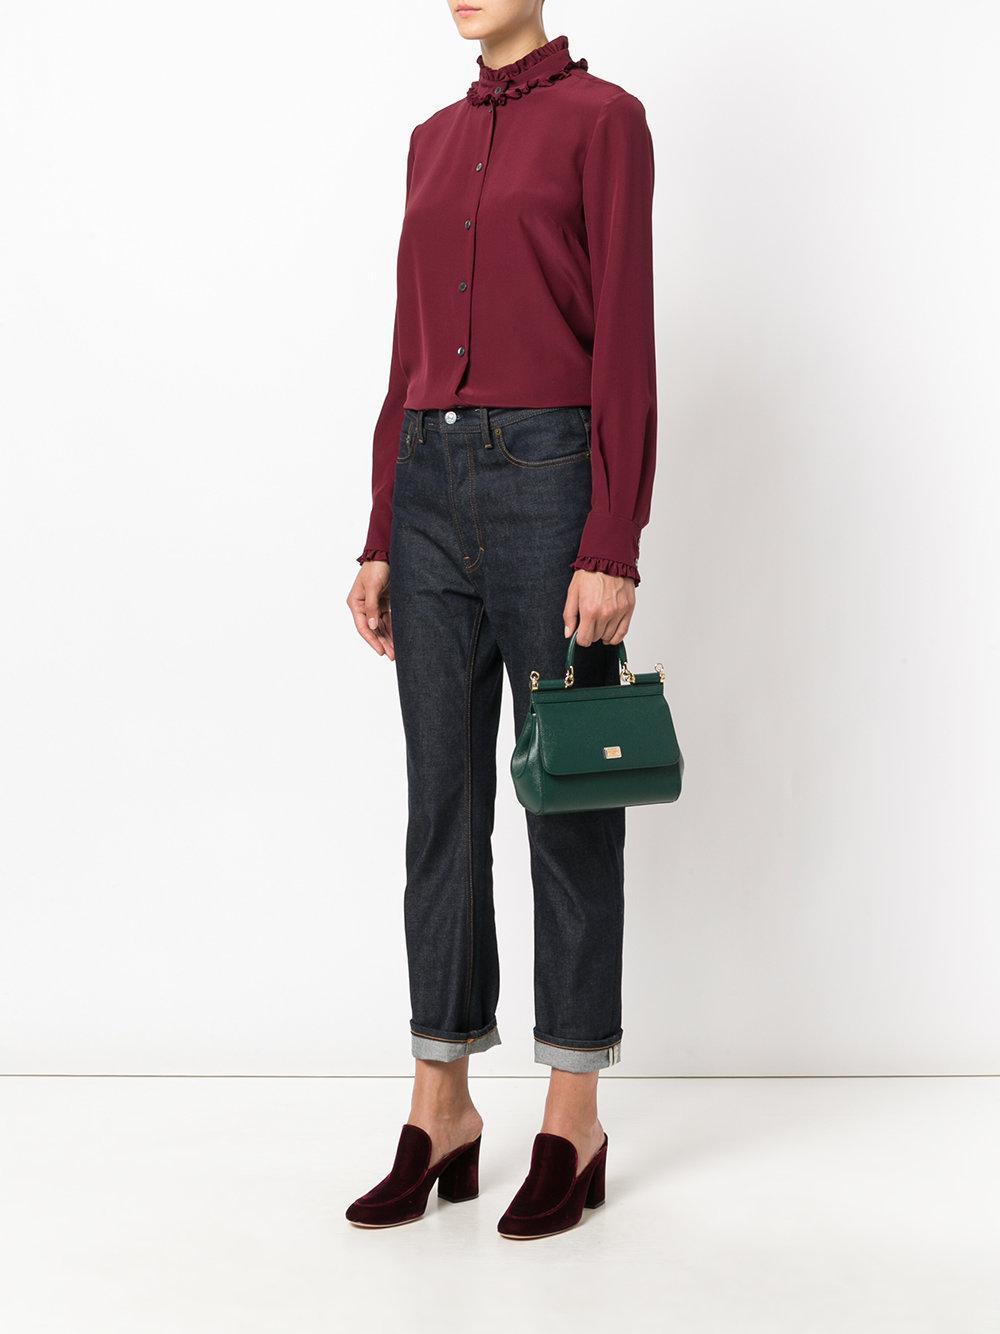 45f20e54a2 Lyst - Dolce   Gabbana Small Sicily Bag in Green